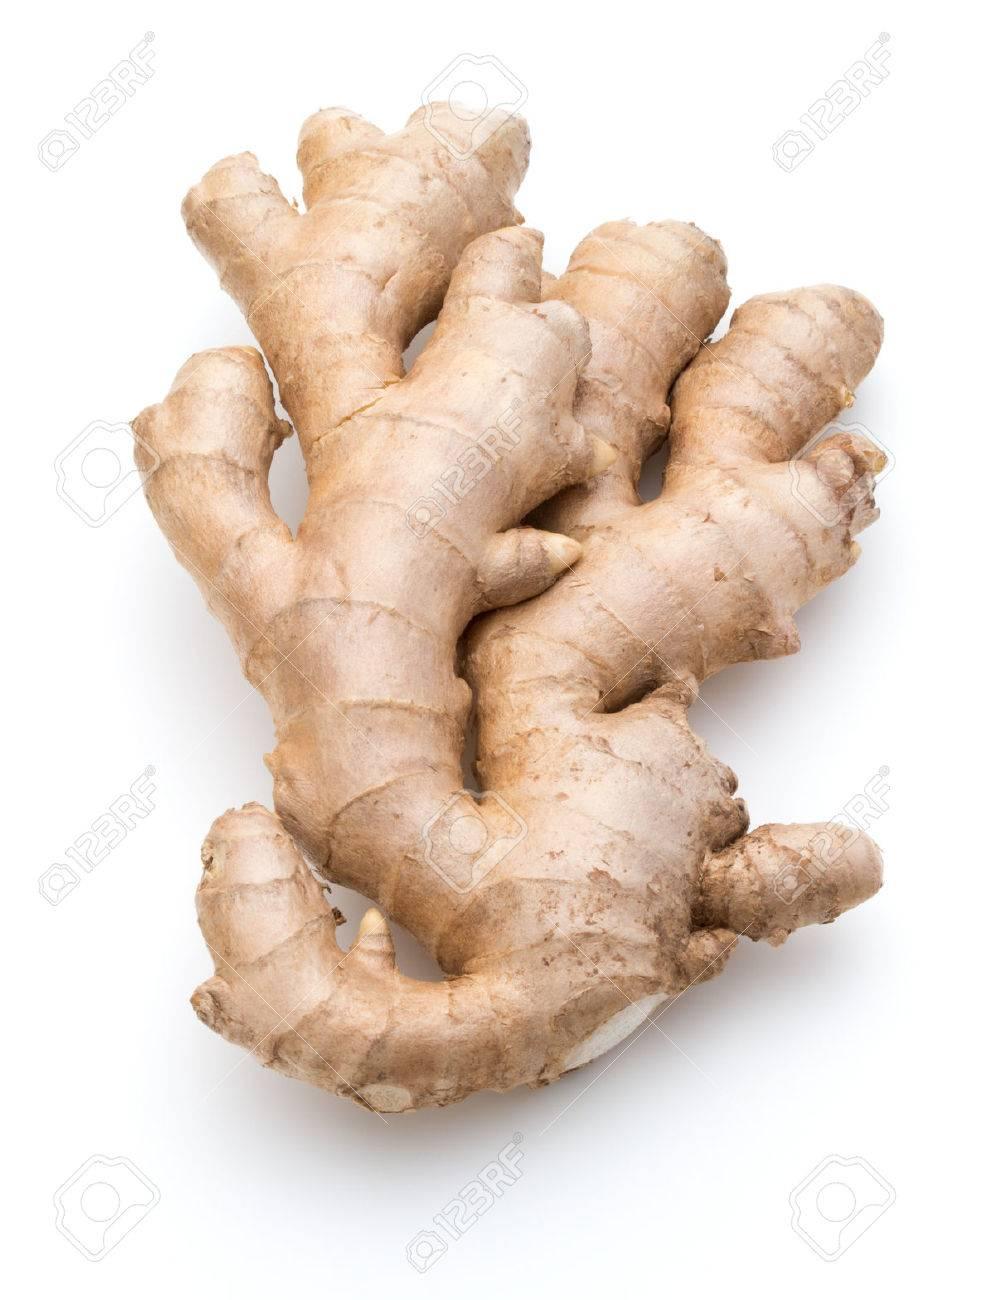 Fresh ginger root or rhizome isolated on white background cutout - 37862859